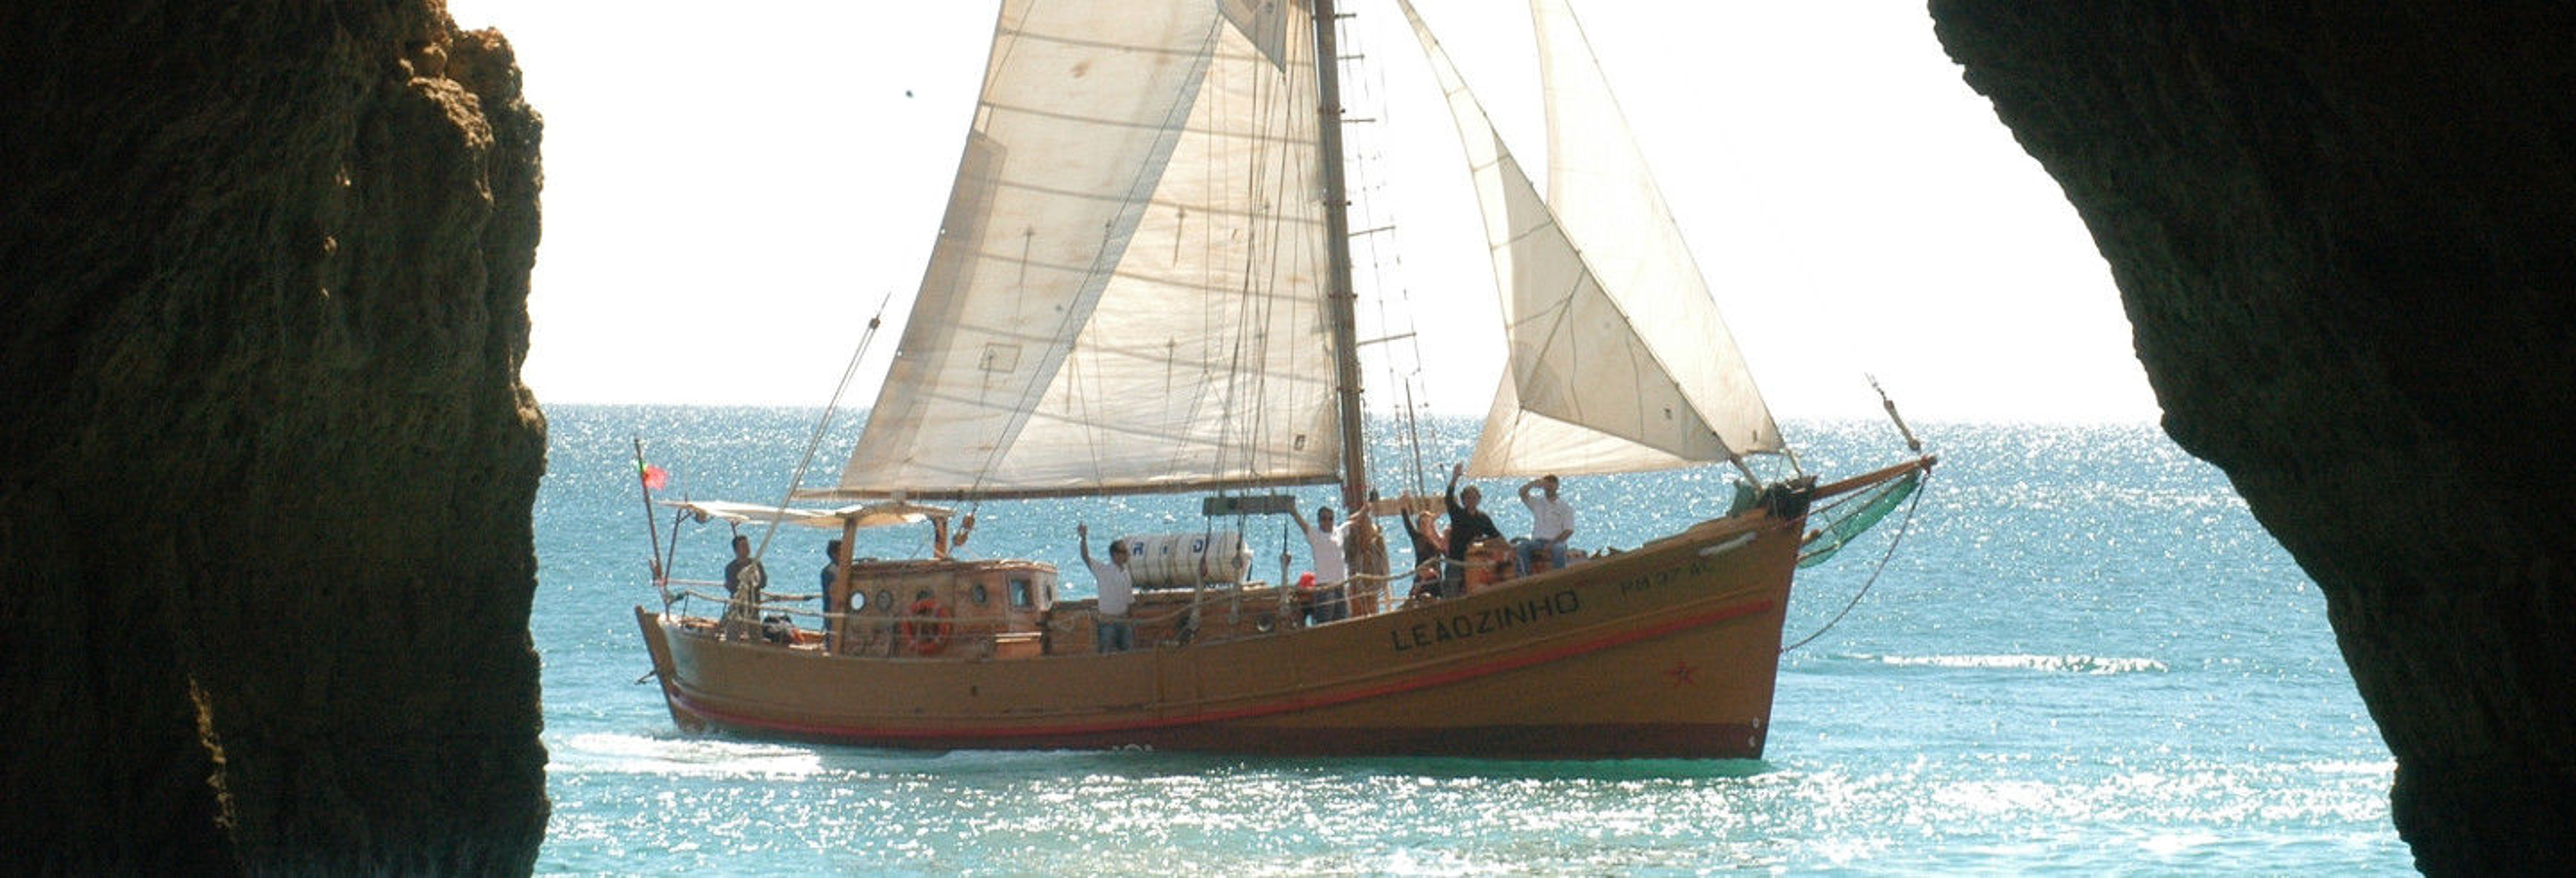 Balade en bateau pirate au coucher du soleil